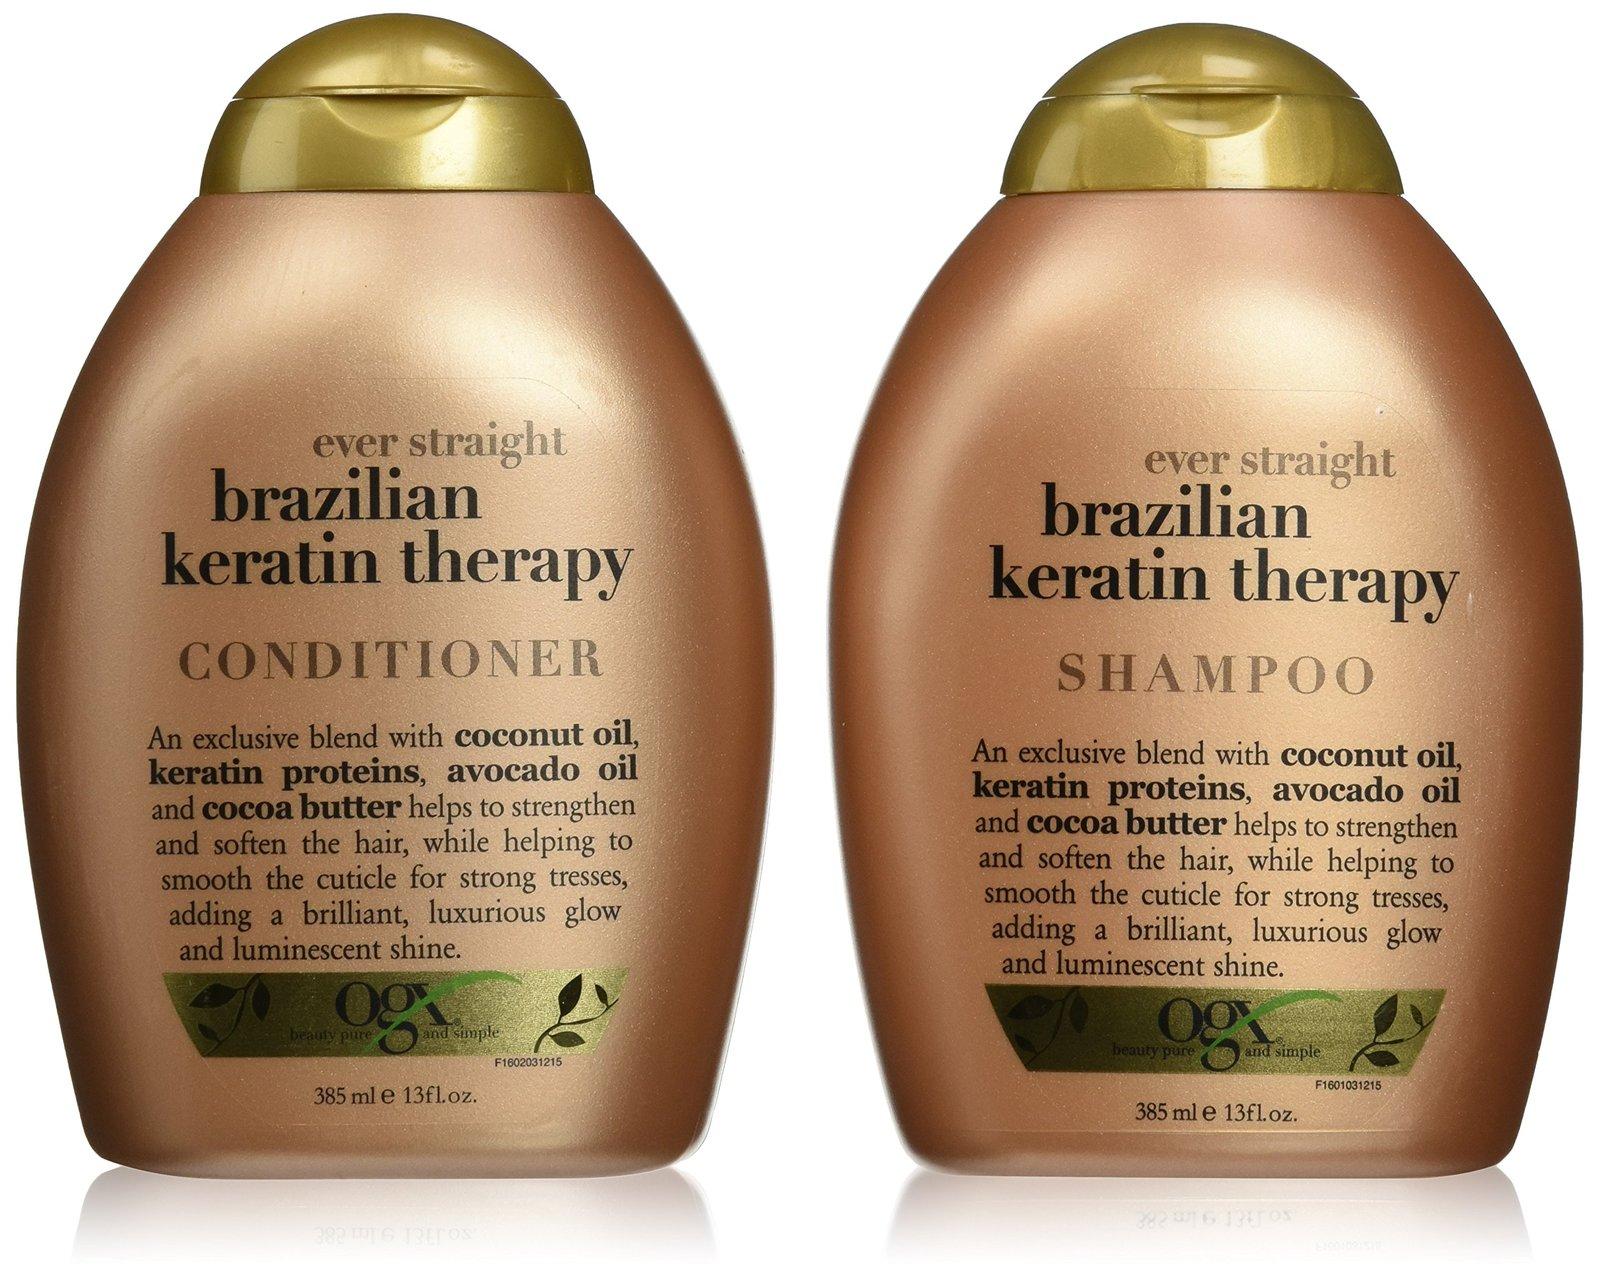 Organix Ever Straight Brazilian Keratin Therapy Shampoo